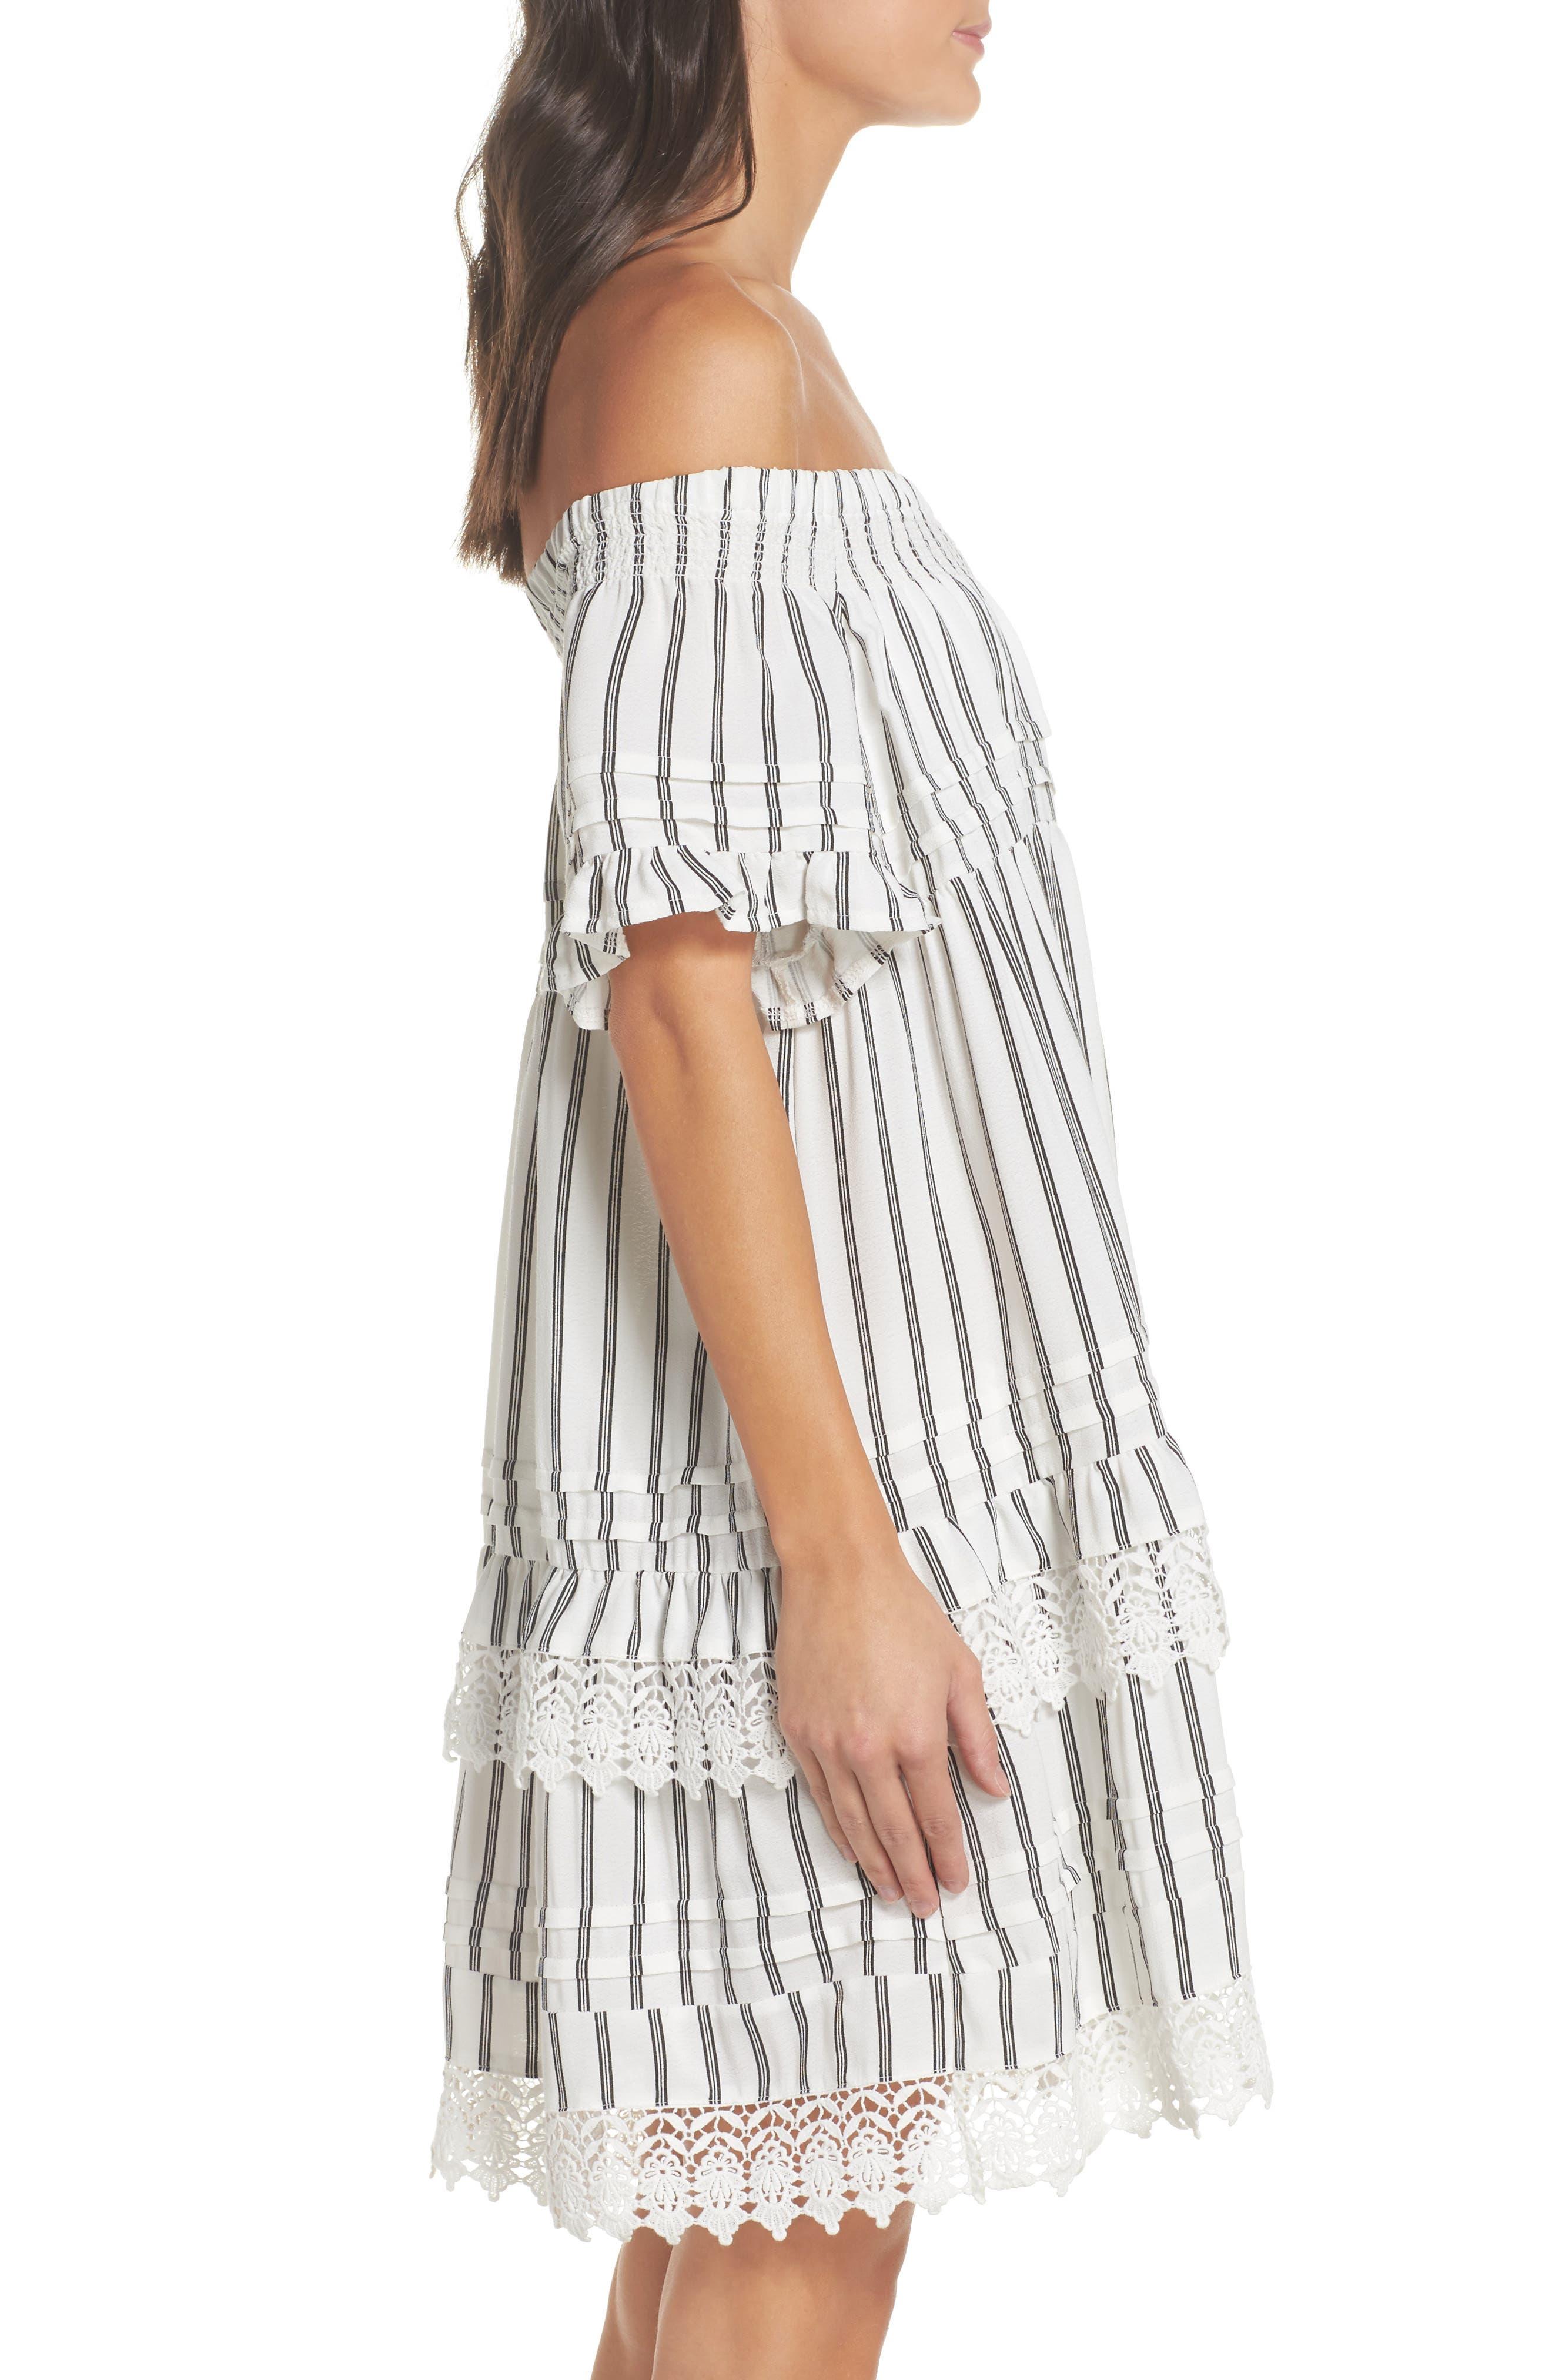 Off the Shoulder Cover-Up Dress,                             Alternate thumbnail 2, color,                             Ivory/ Black